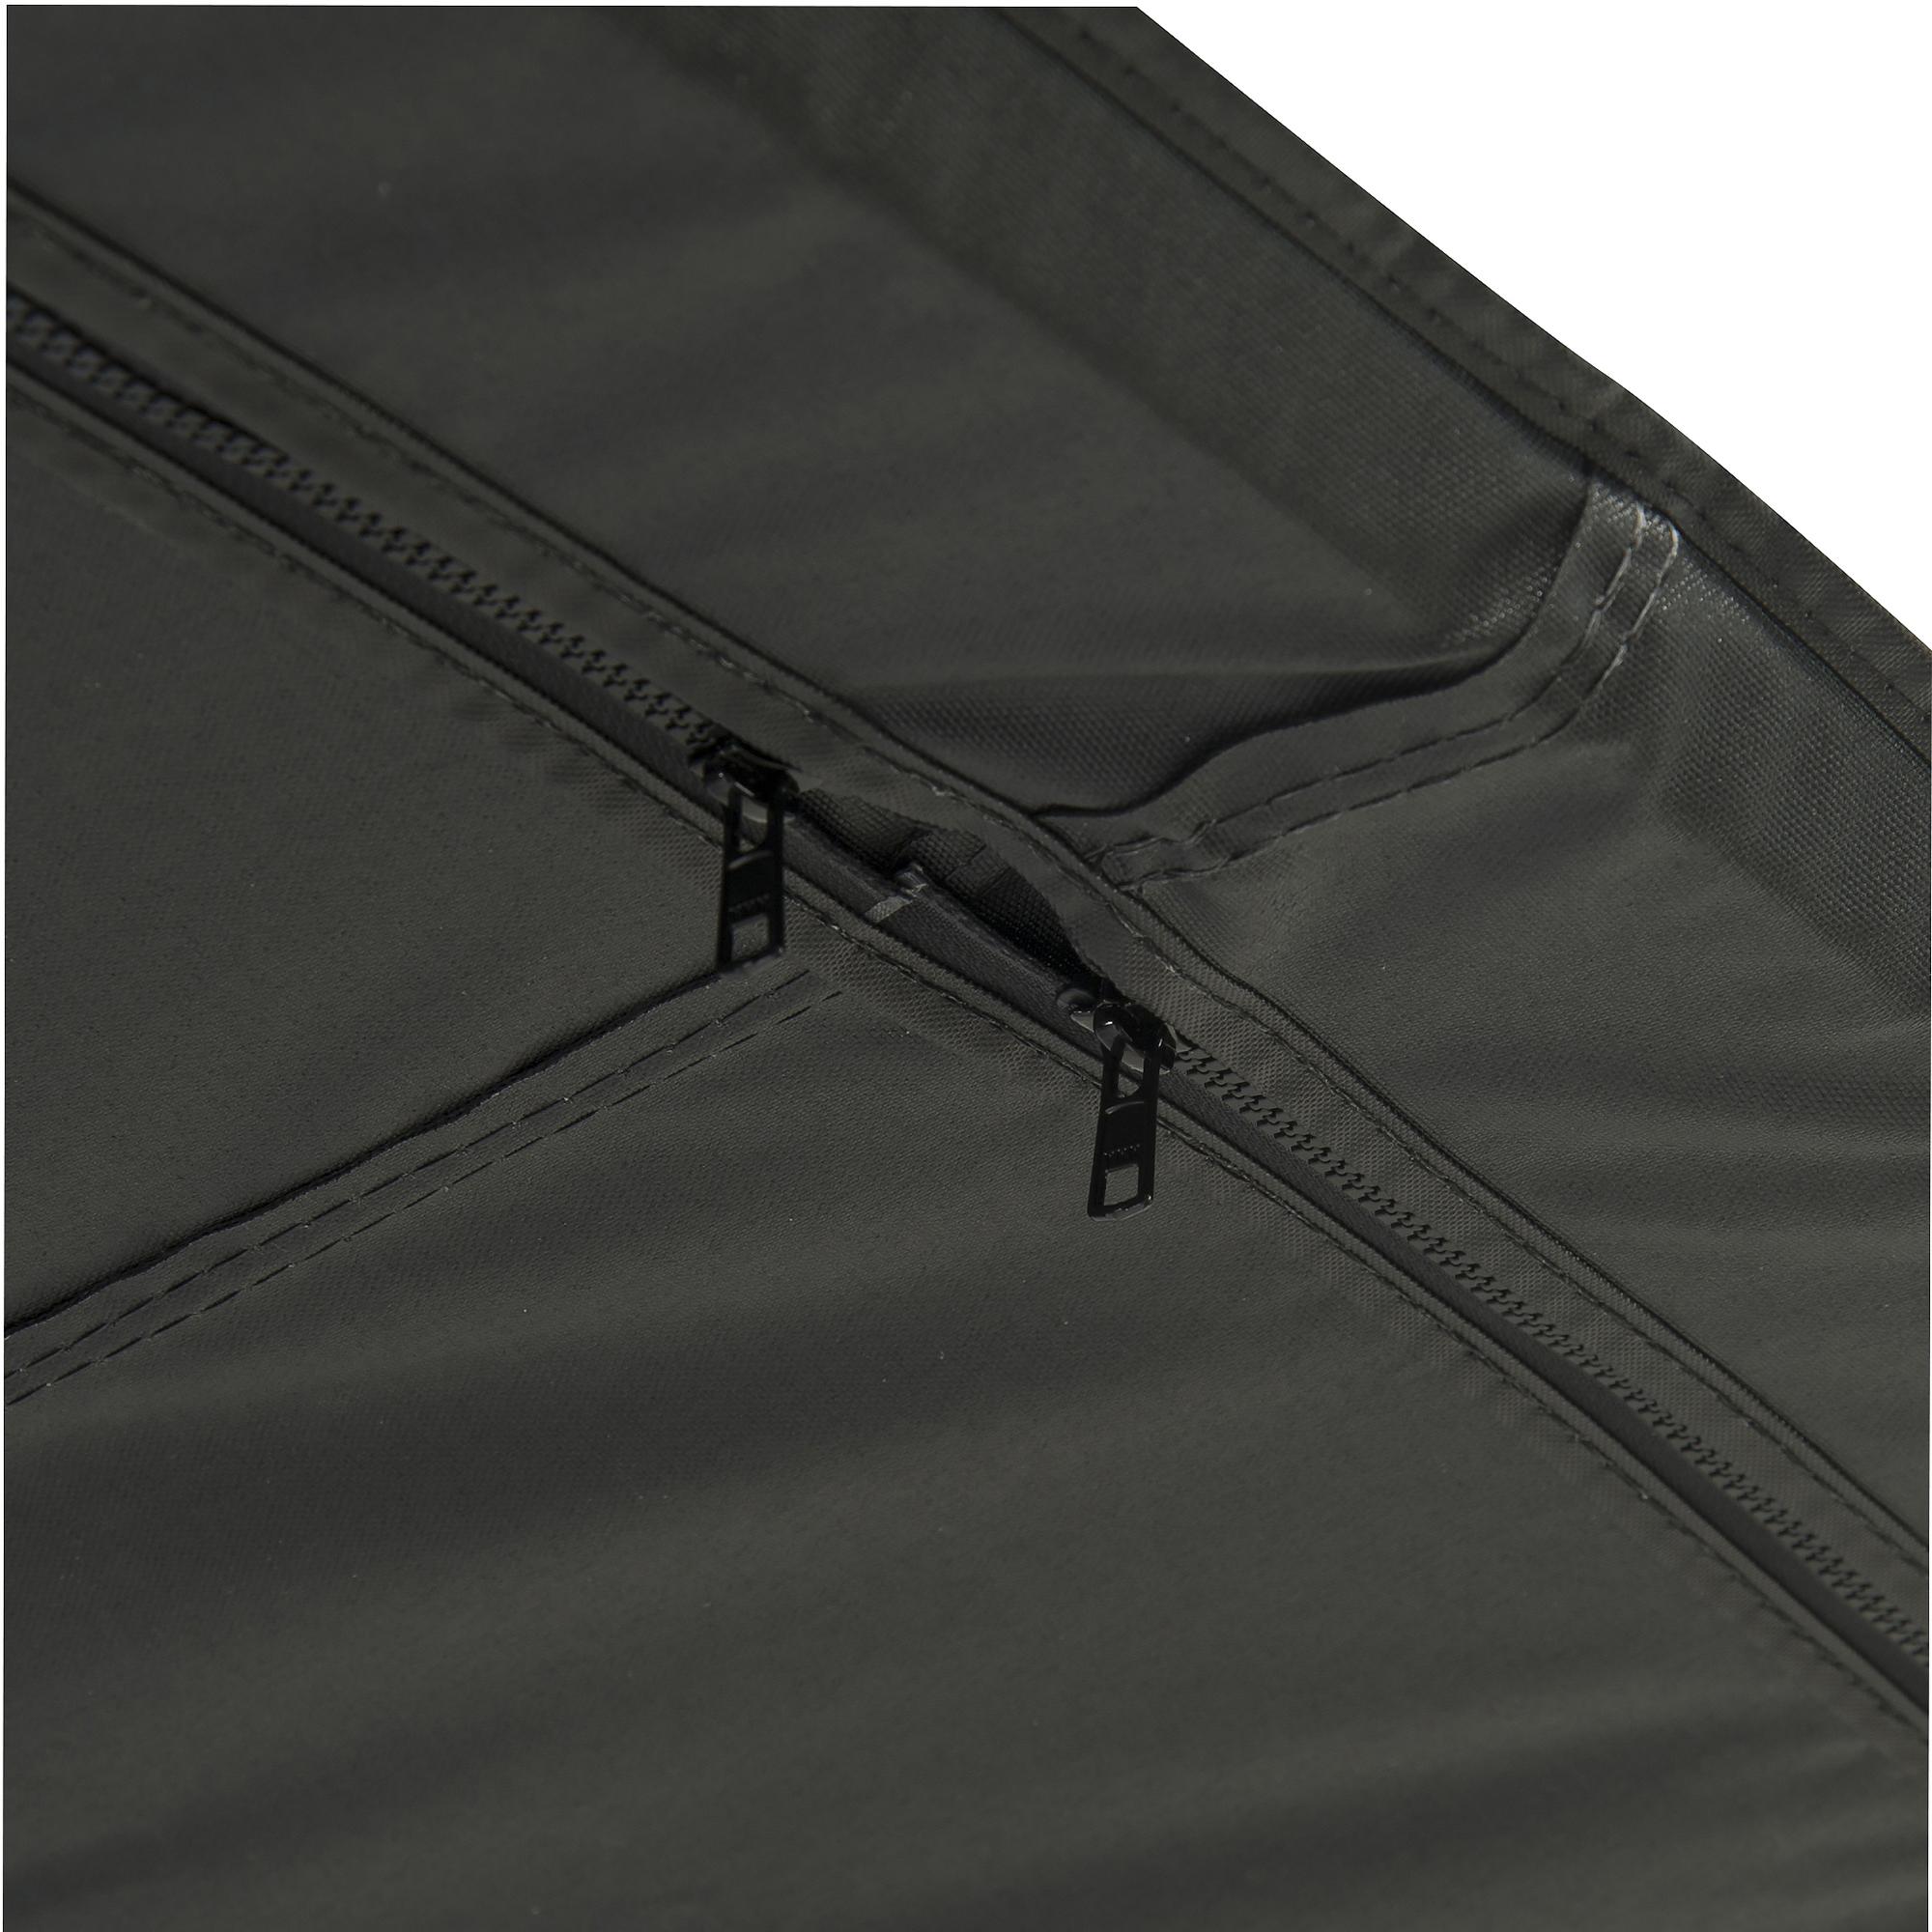 "Traditional Pontoon Bimini Top SurLast Polyester 1-1/4"" Standard Frame 96""-102""W"